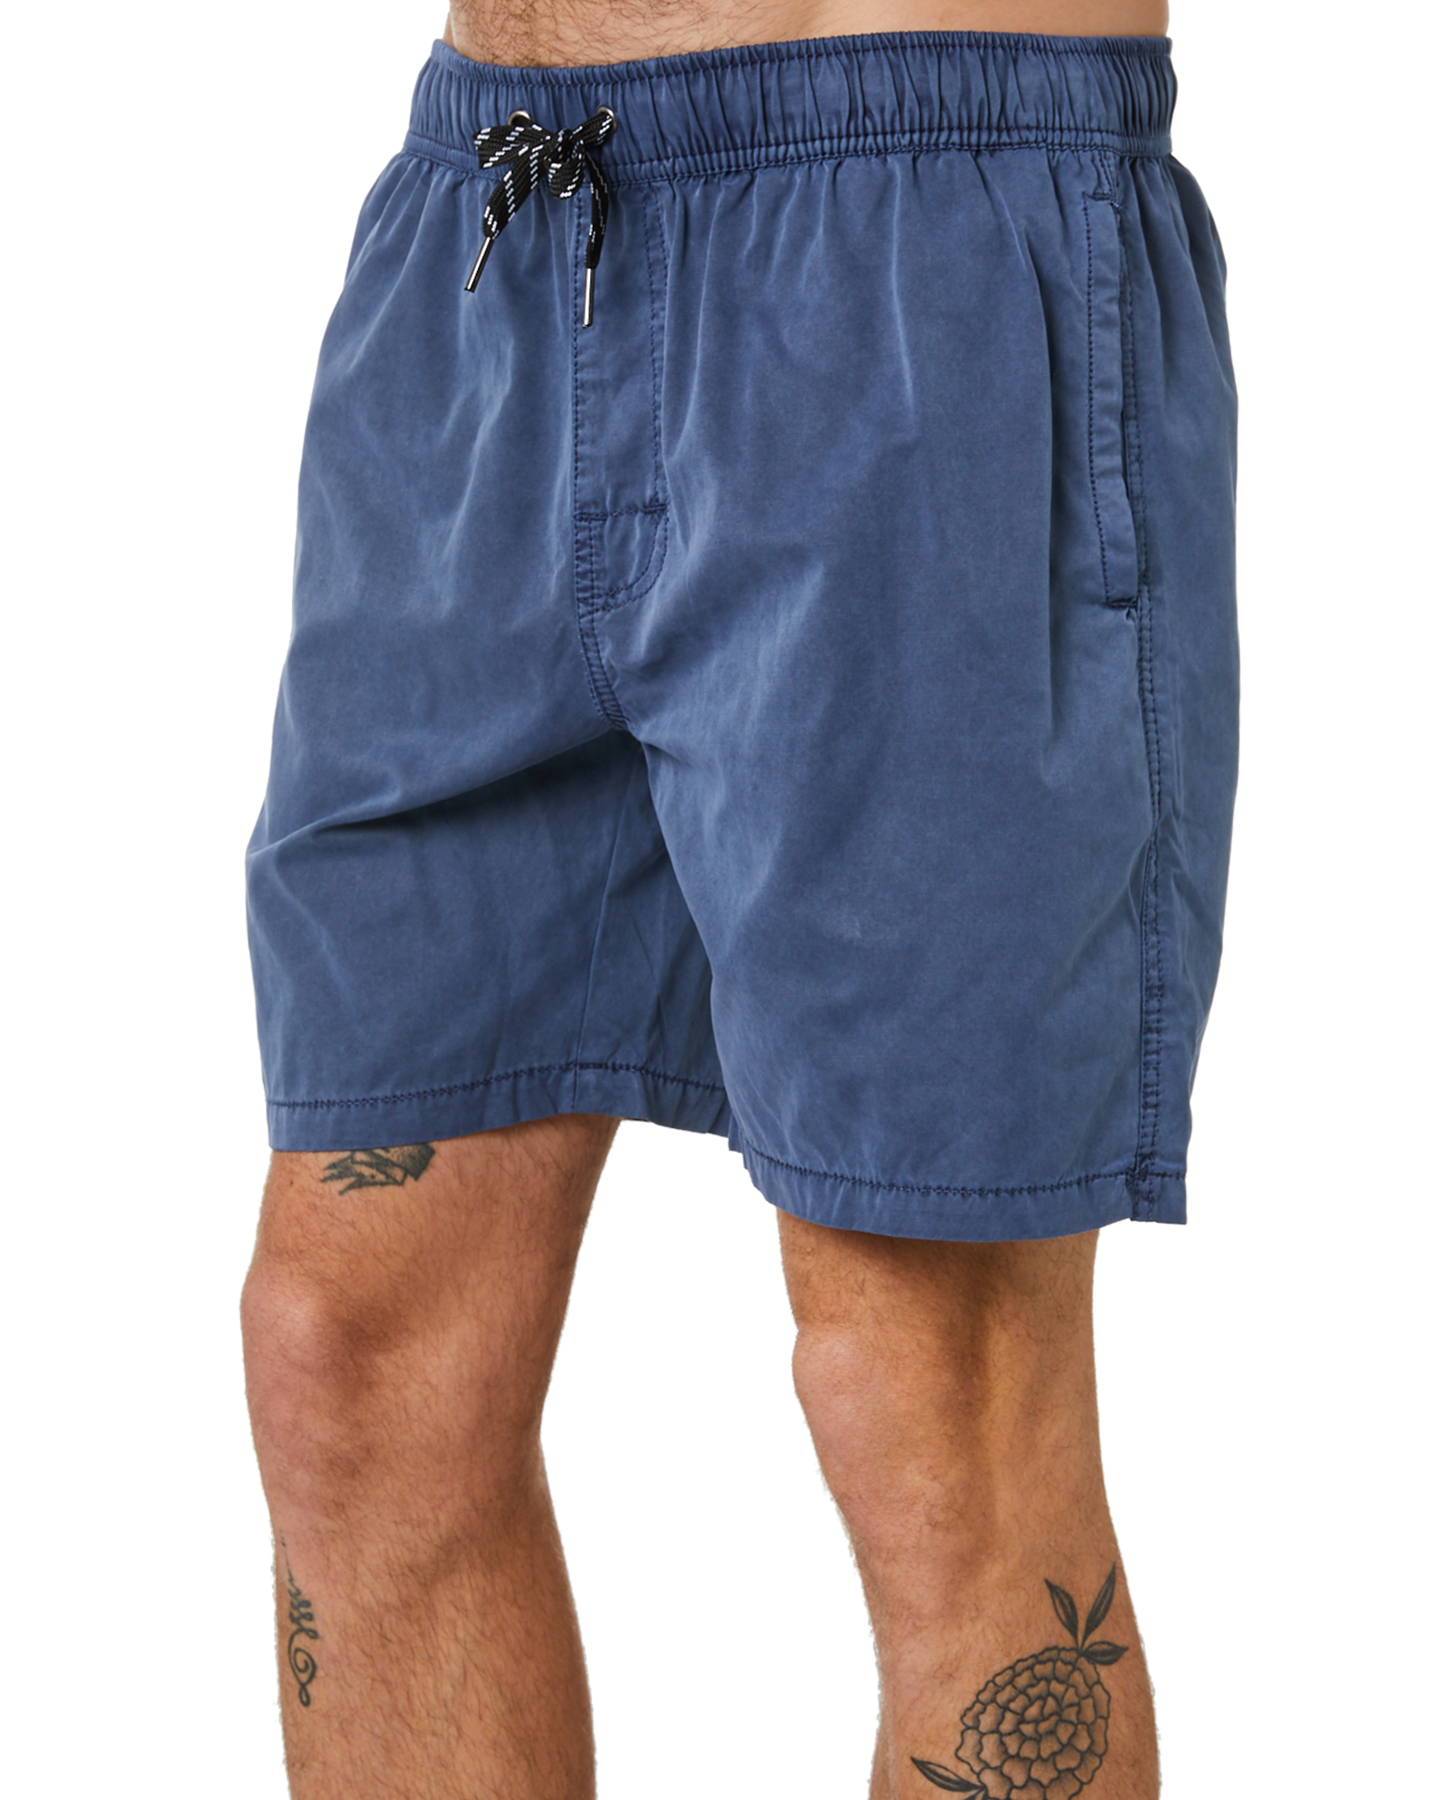 New-Swell-Men-039-s-Malibu-Mens-Beach-Short-Cotton-Polyester-Grey thumbnail 25